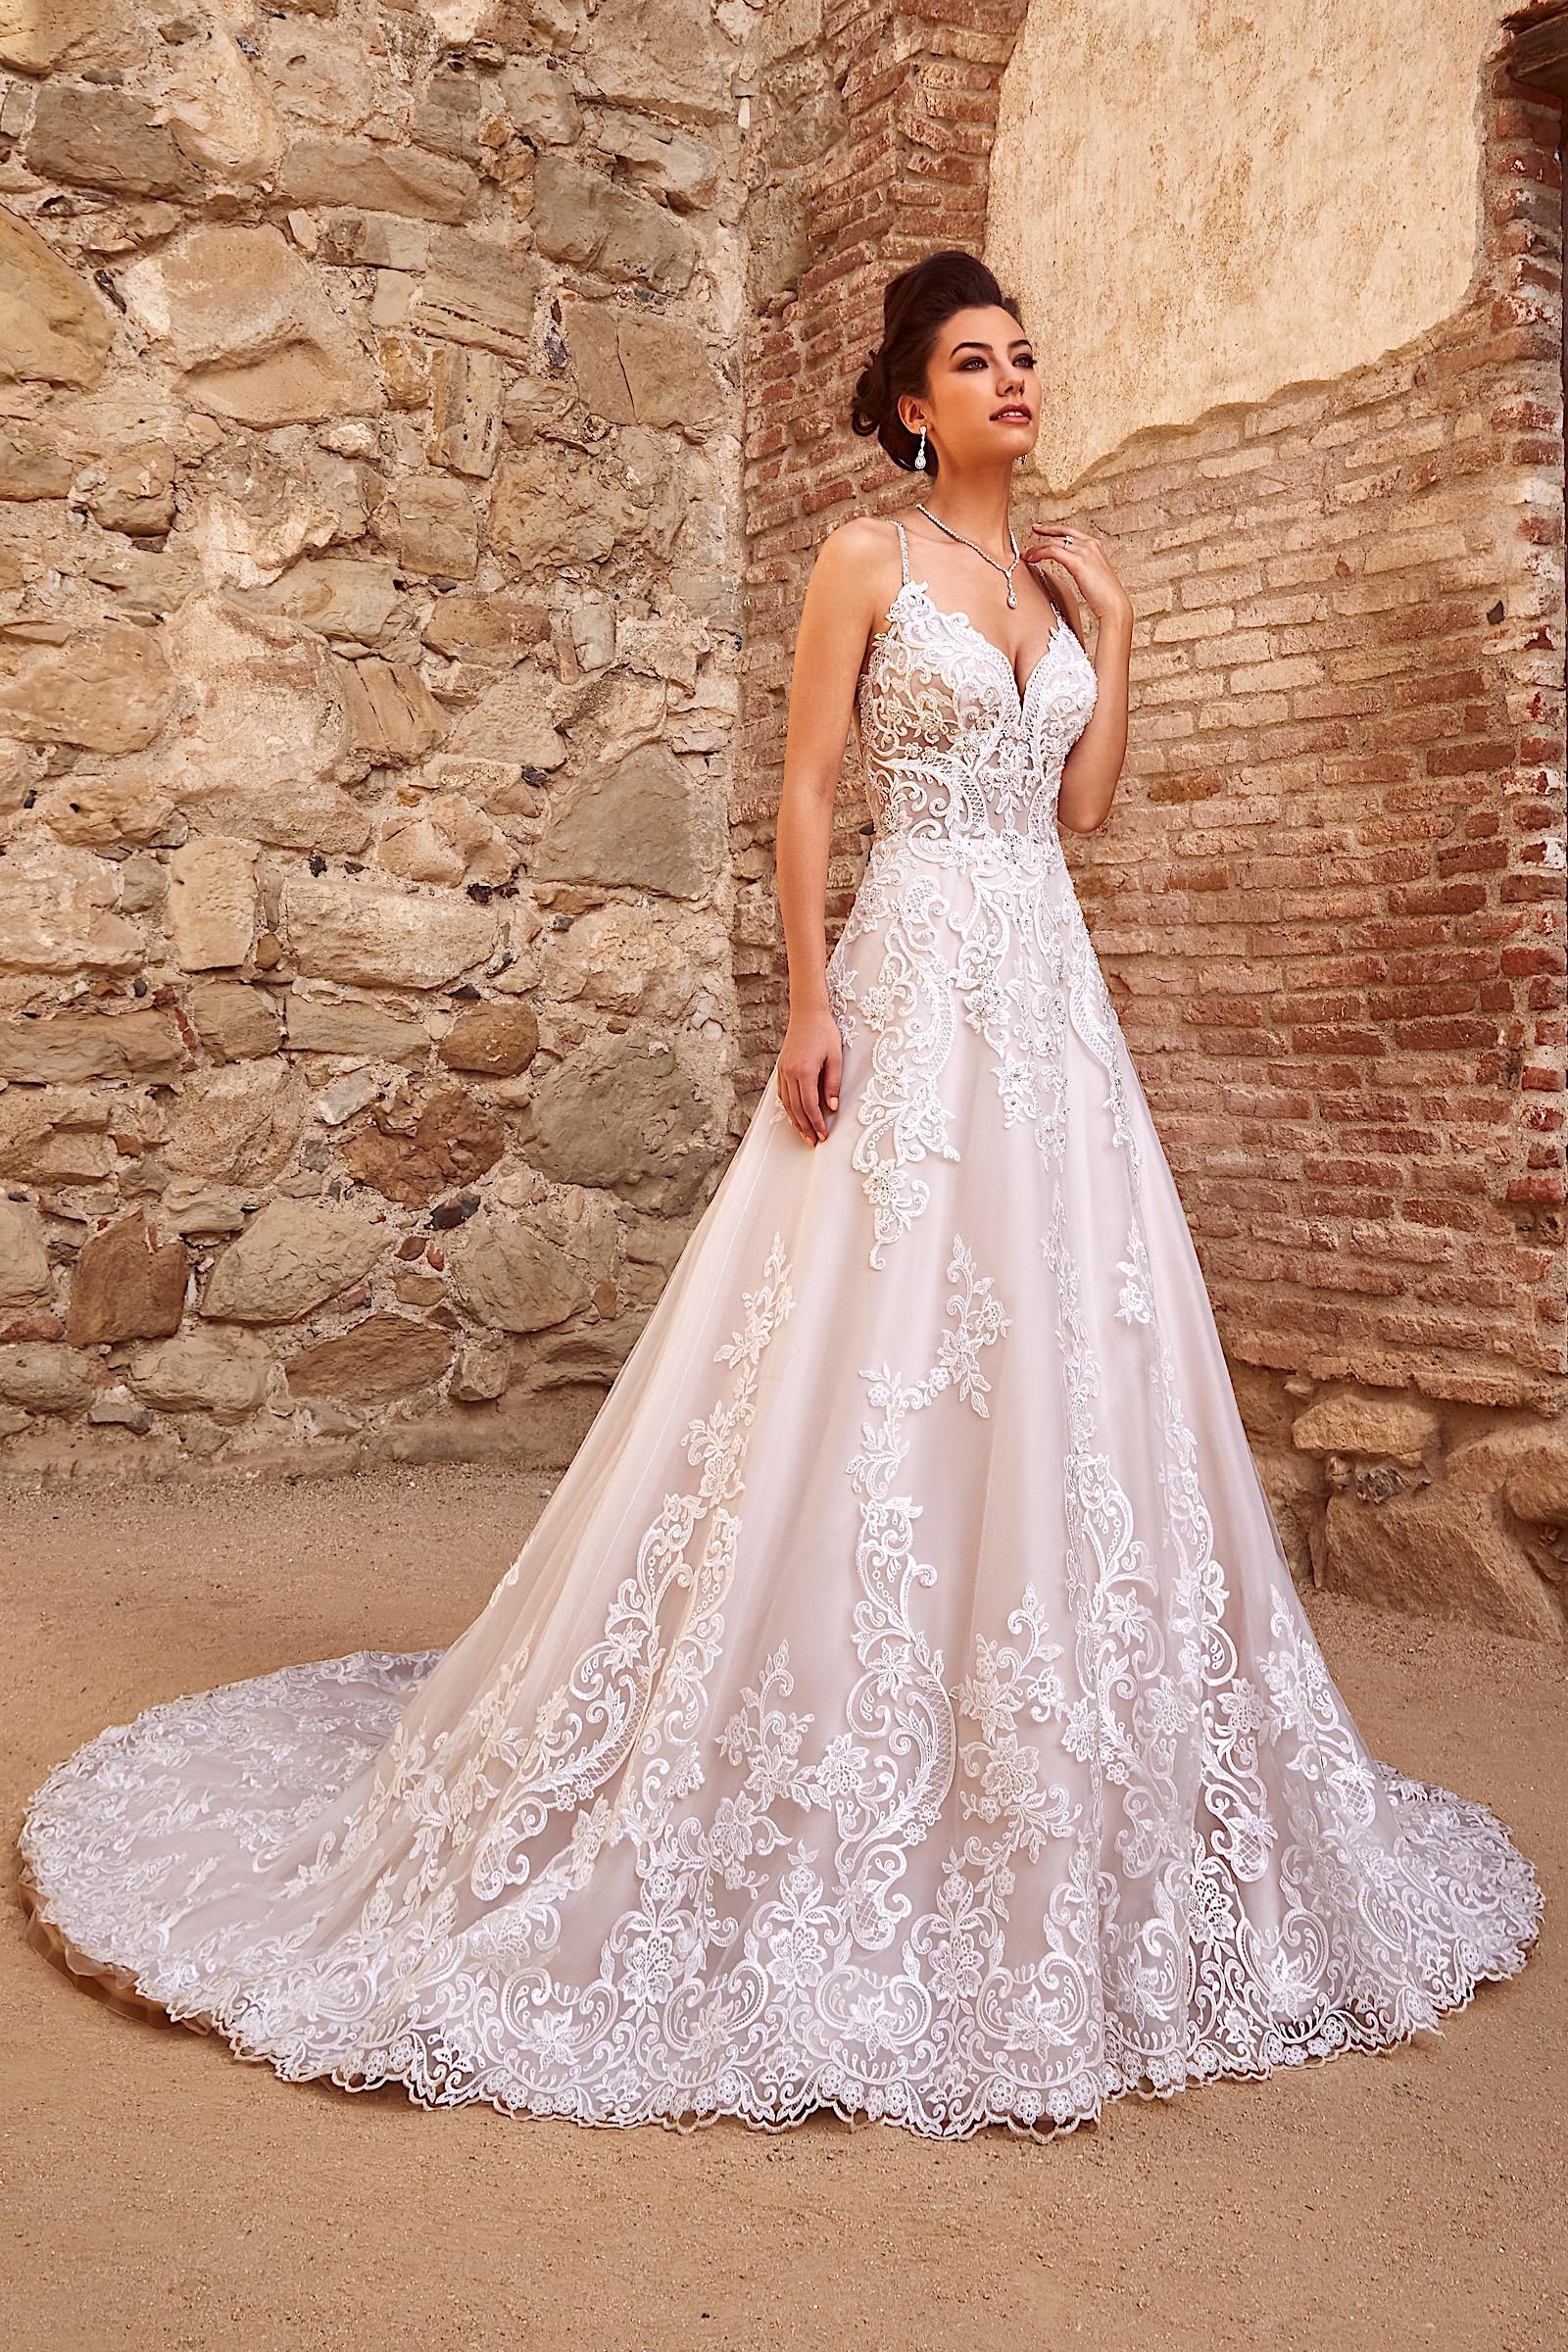 Wedding Dress Style Perla The Bridal Company,Black Dress To Wedding